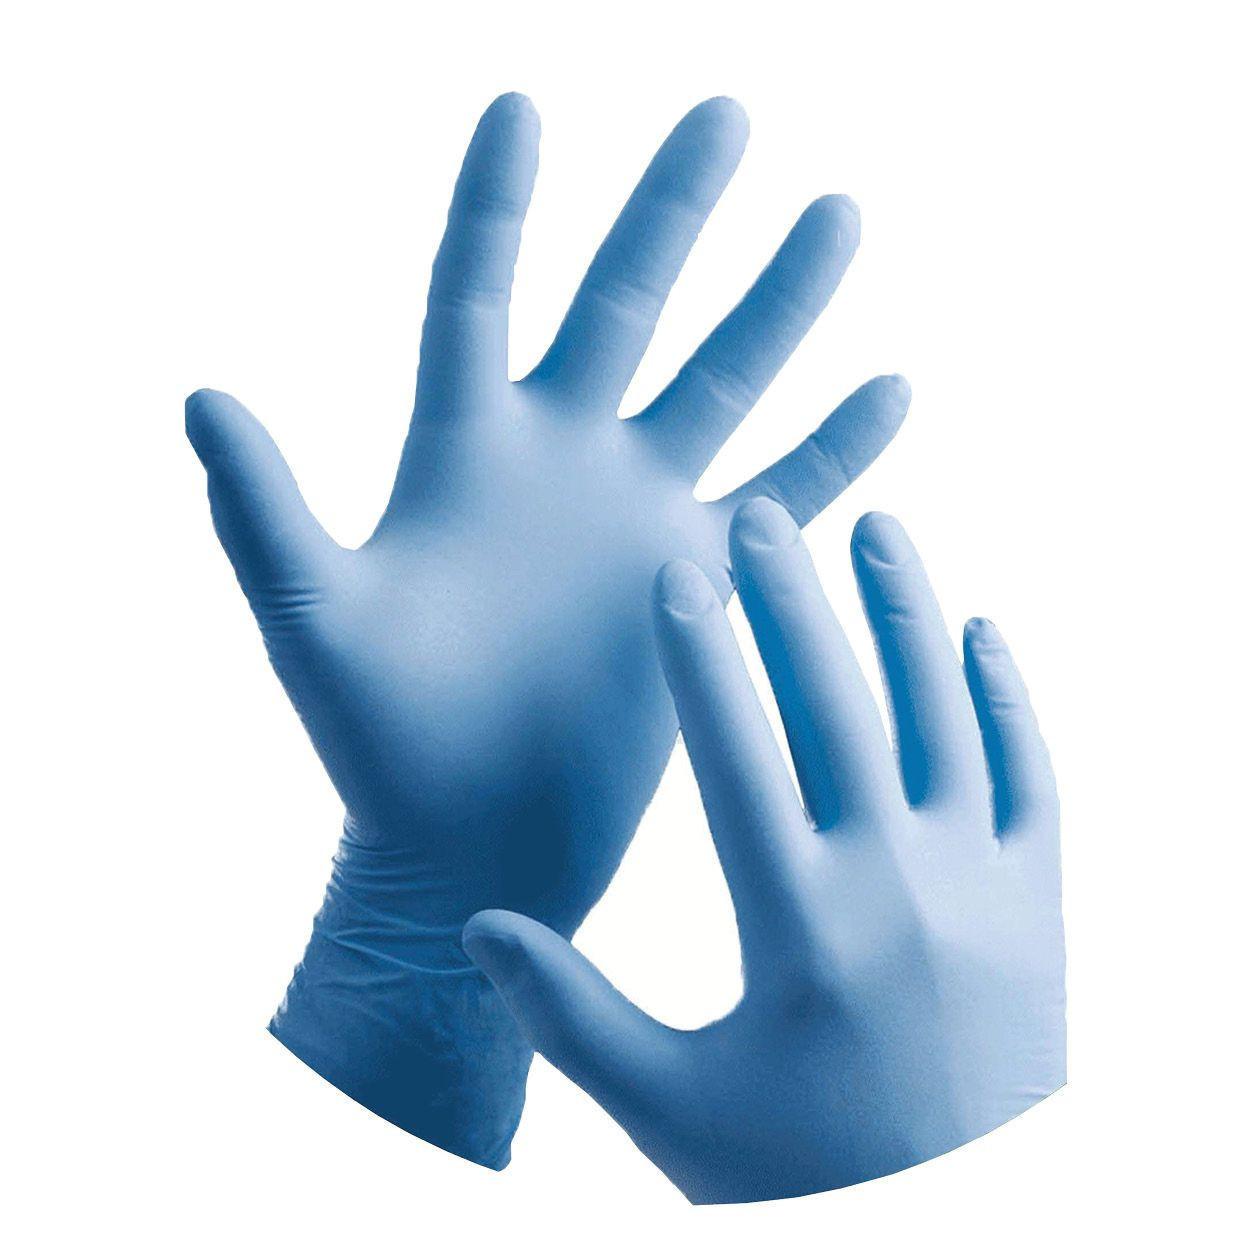 Cranberry 300 Powder Free Nitrile Examination Gloves